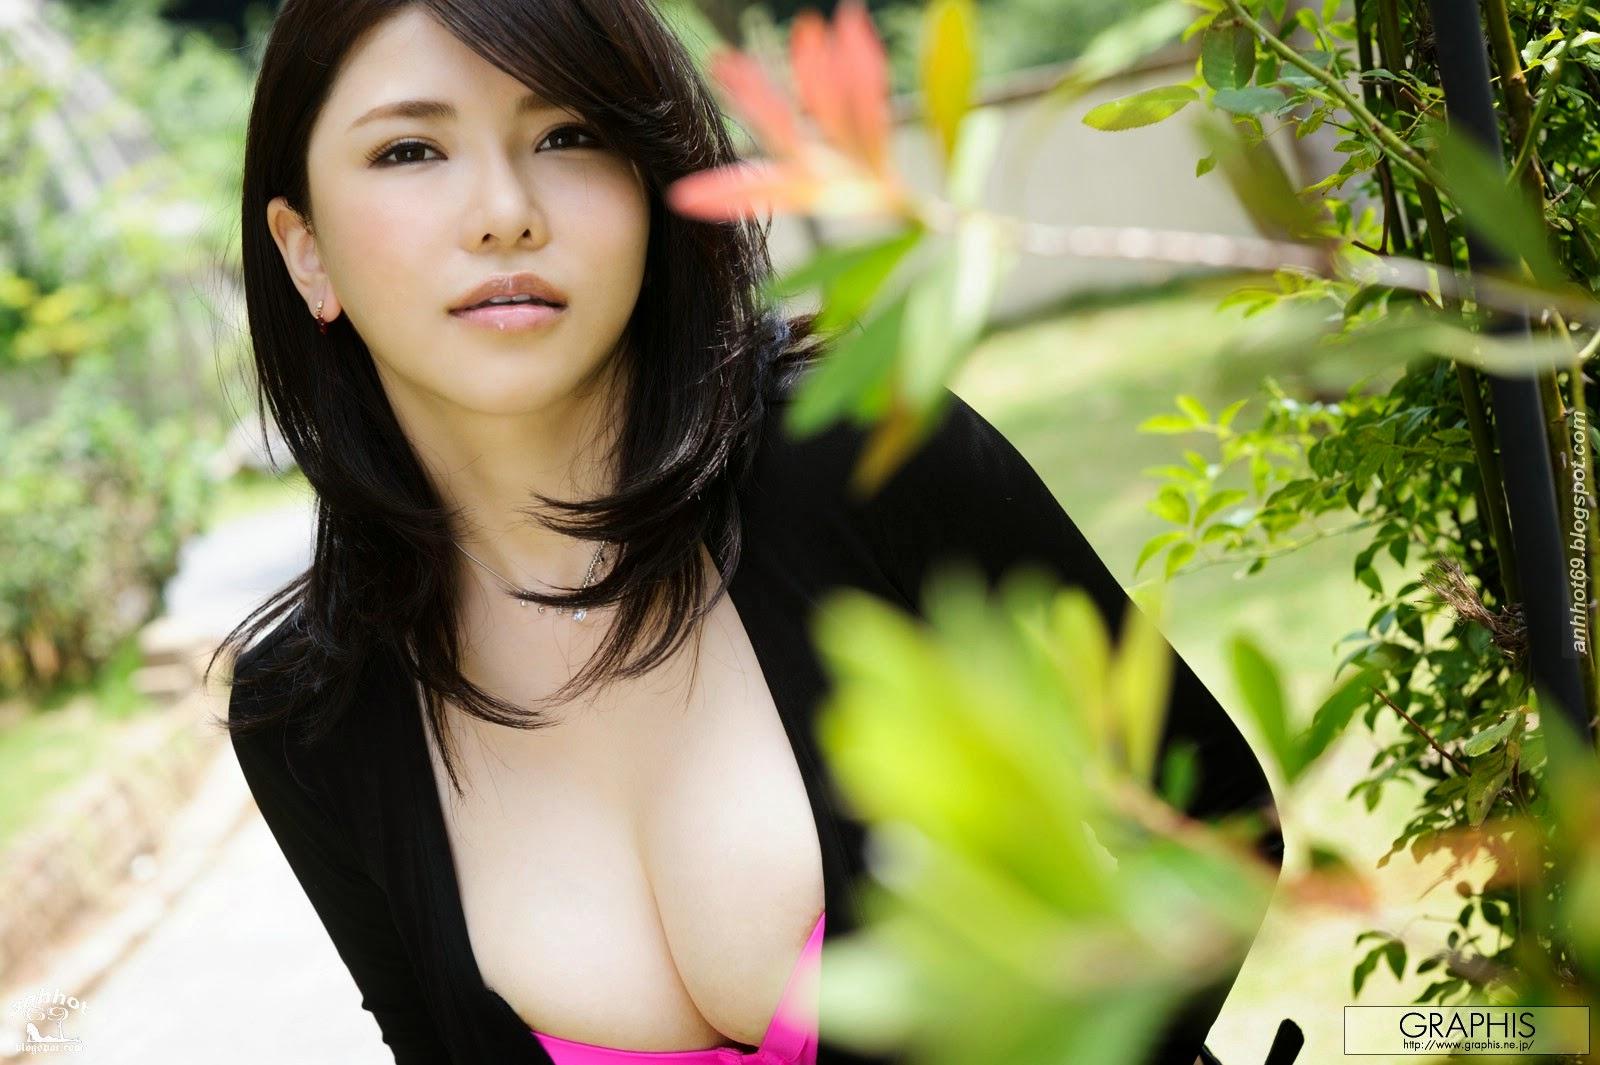 anri-okita-02298706